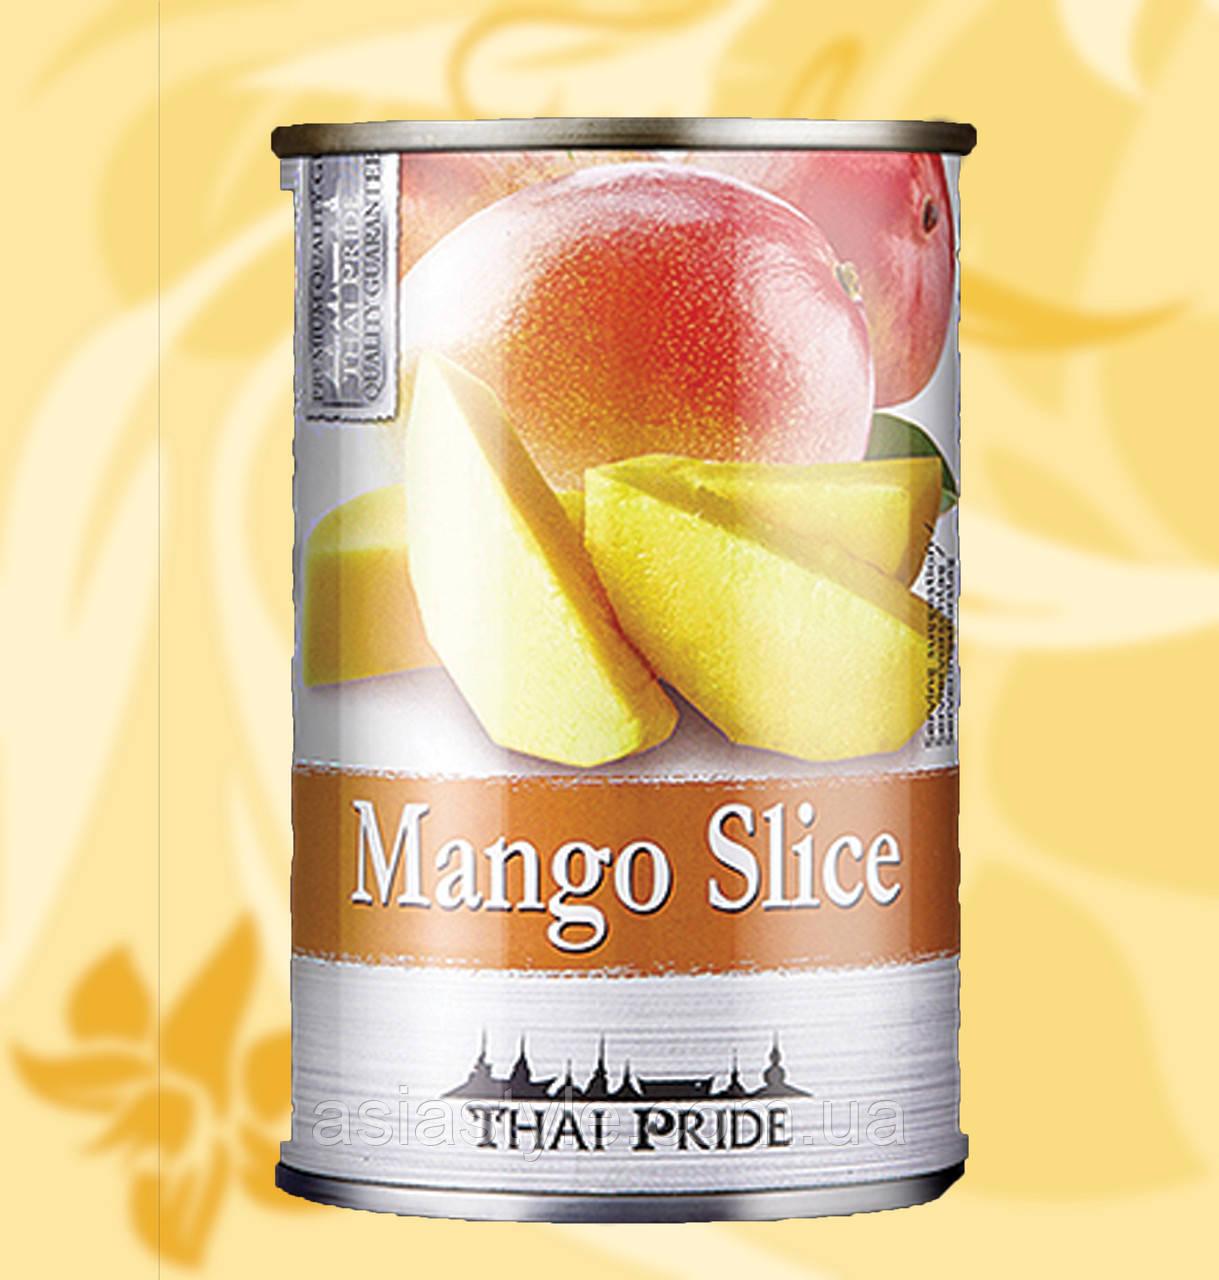 Манго в сиропі, слайси, Thai Pride, 425г, Таїланд, АФ